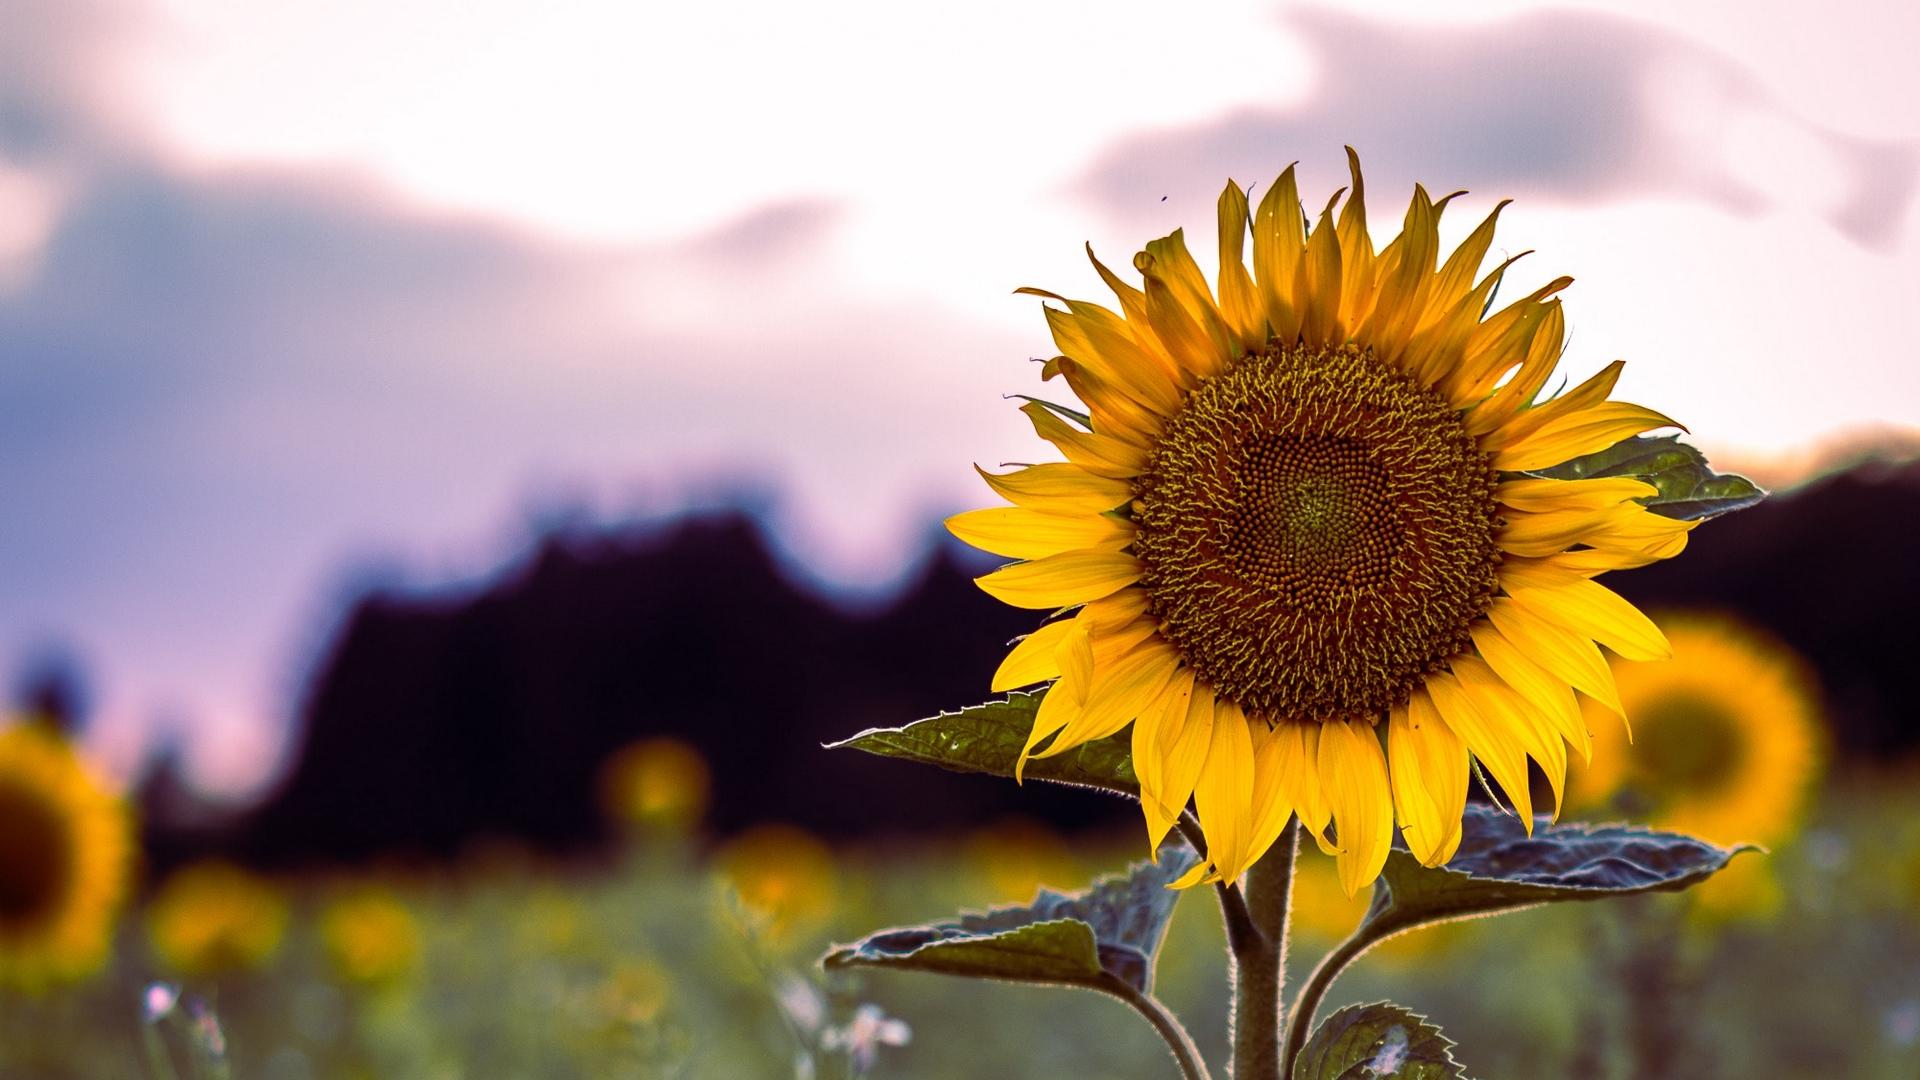 sunflower_bloom_field_124639_1920x1080.jpg